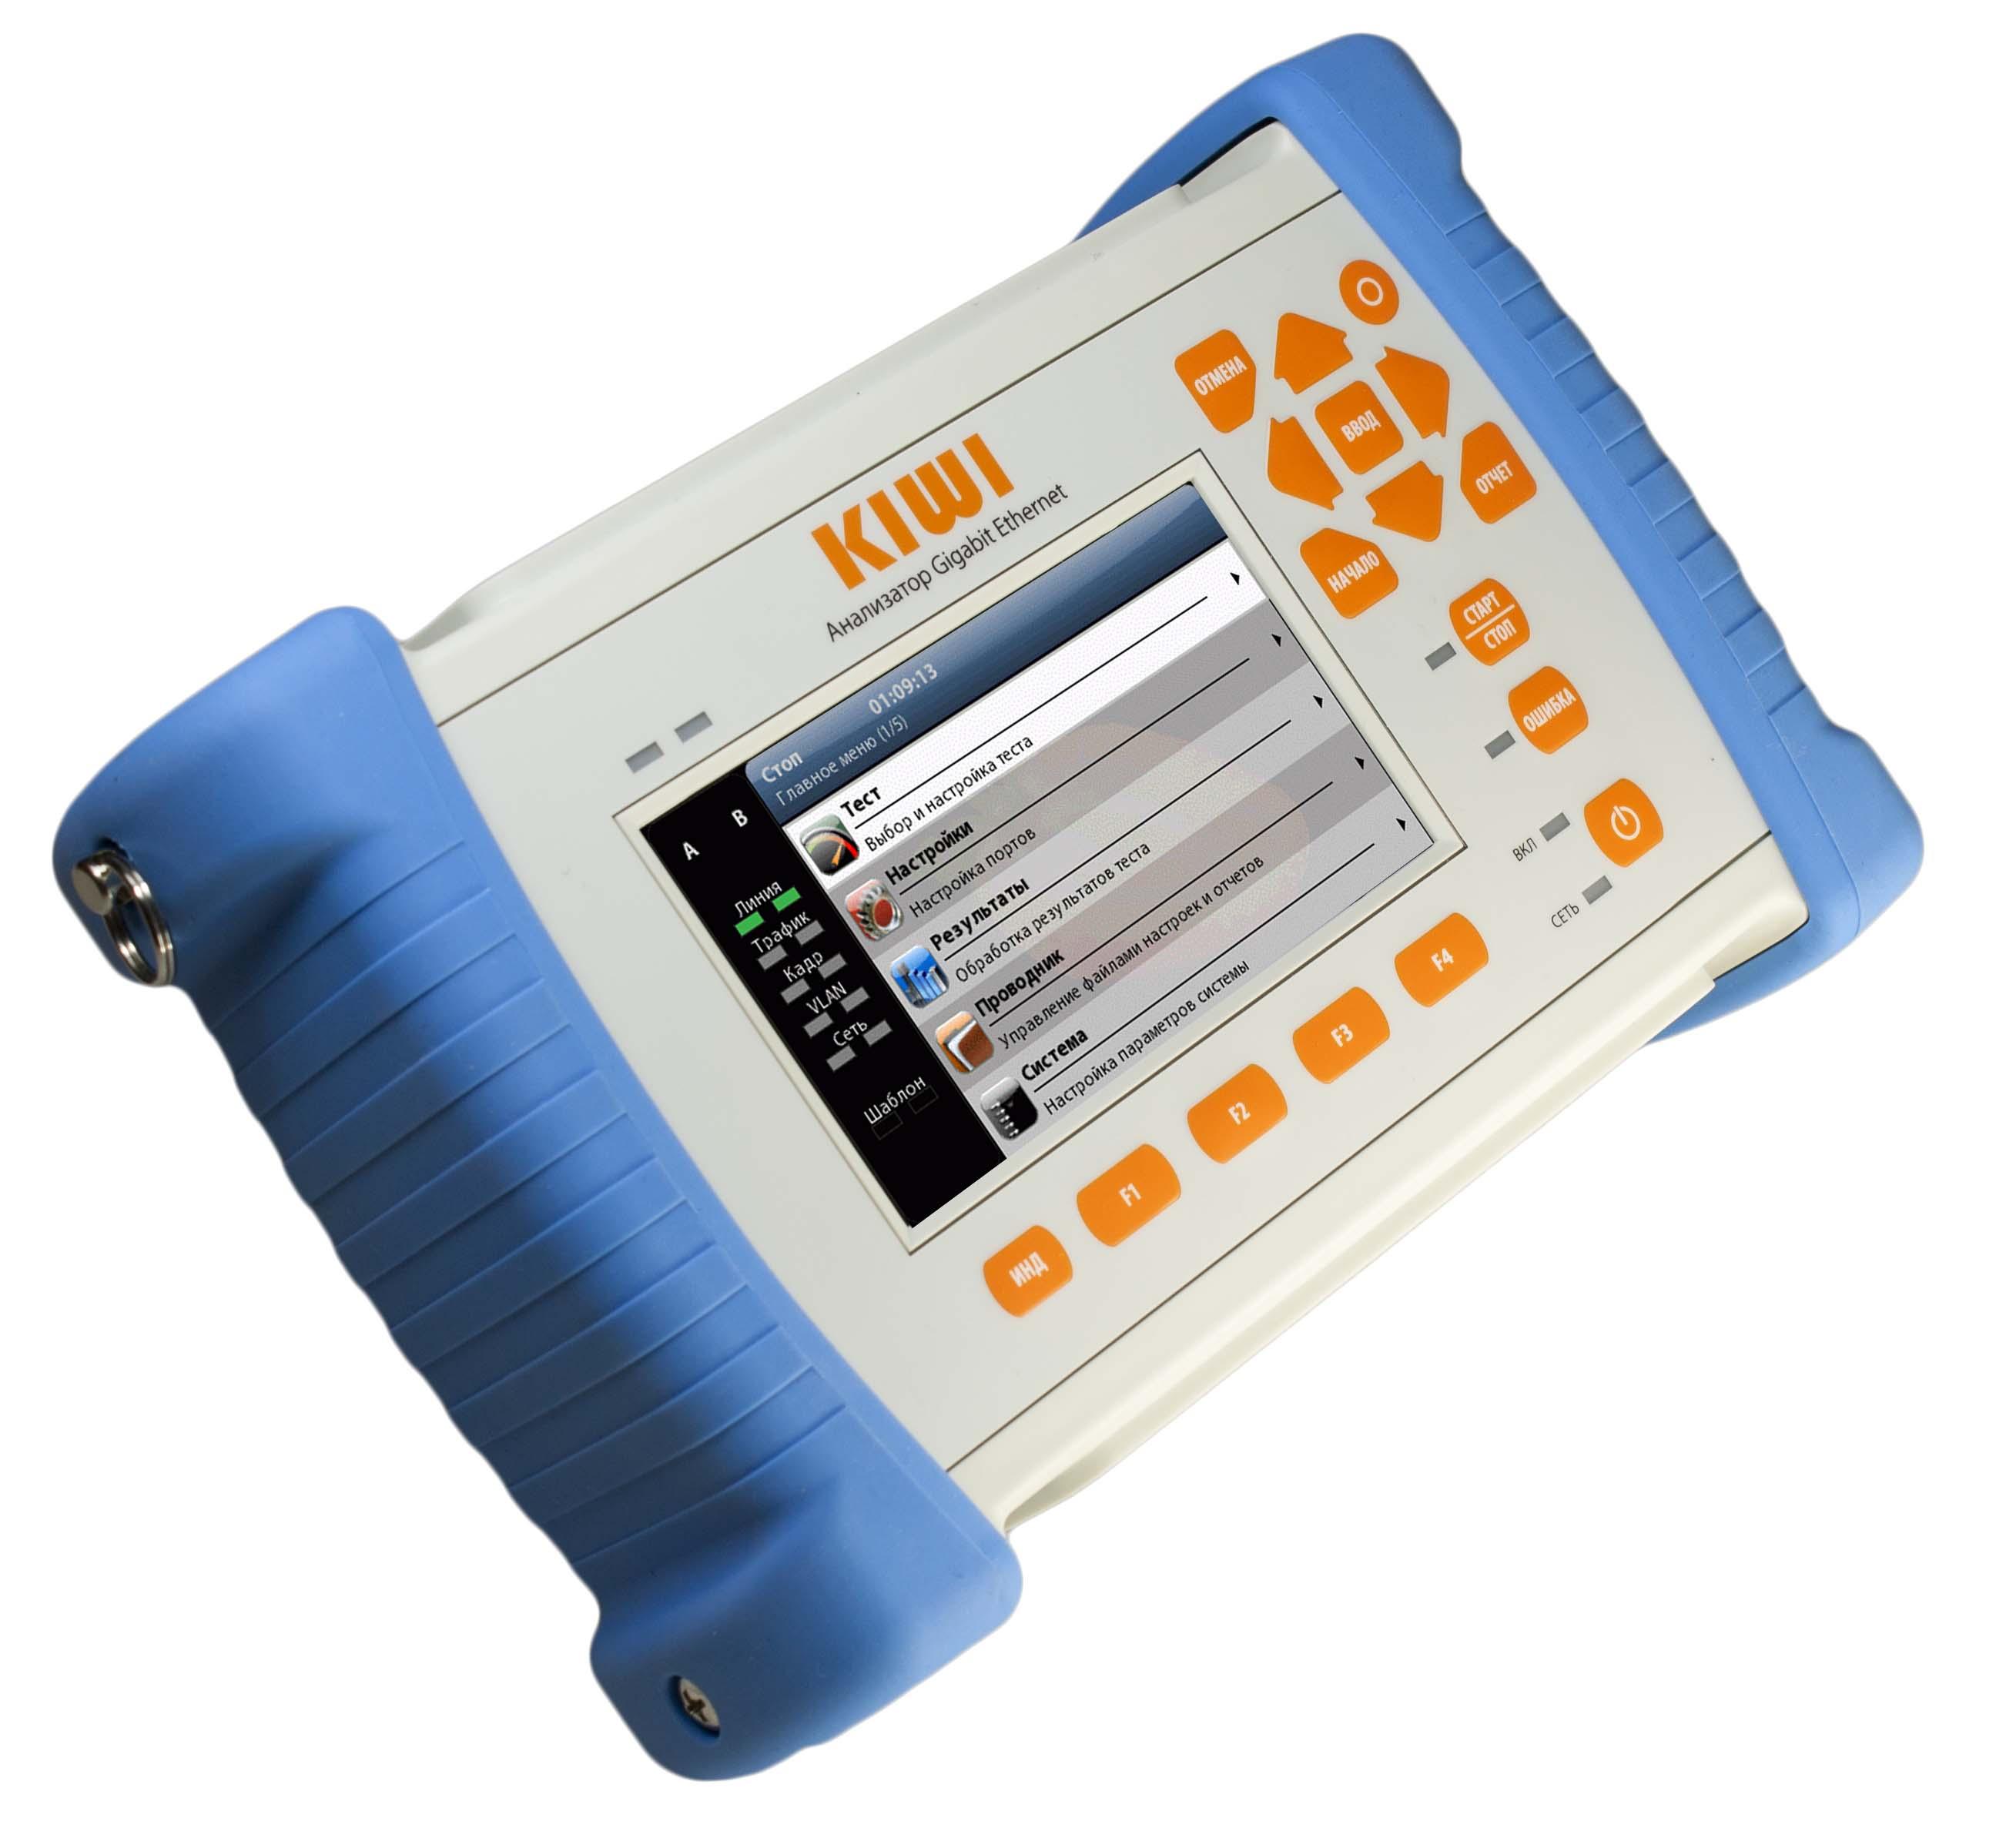 KIWI-3130 : Компактный анализатор протоколов